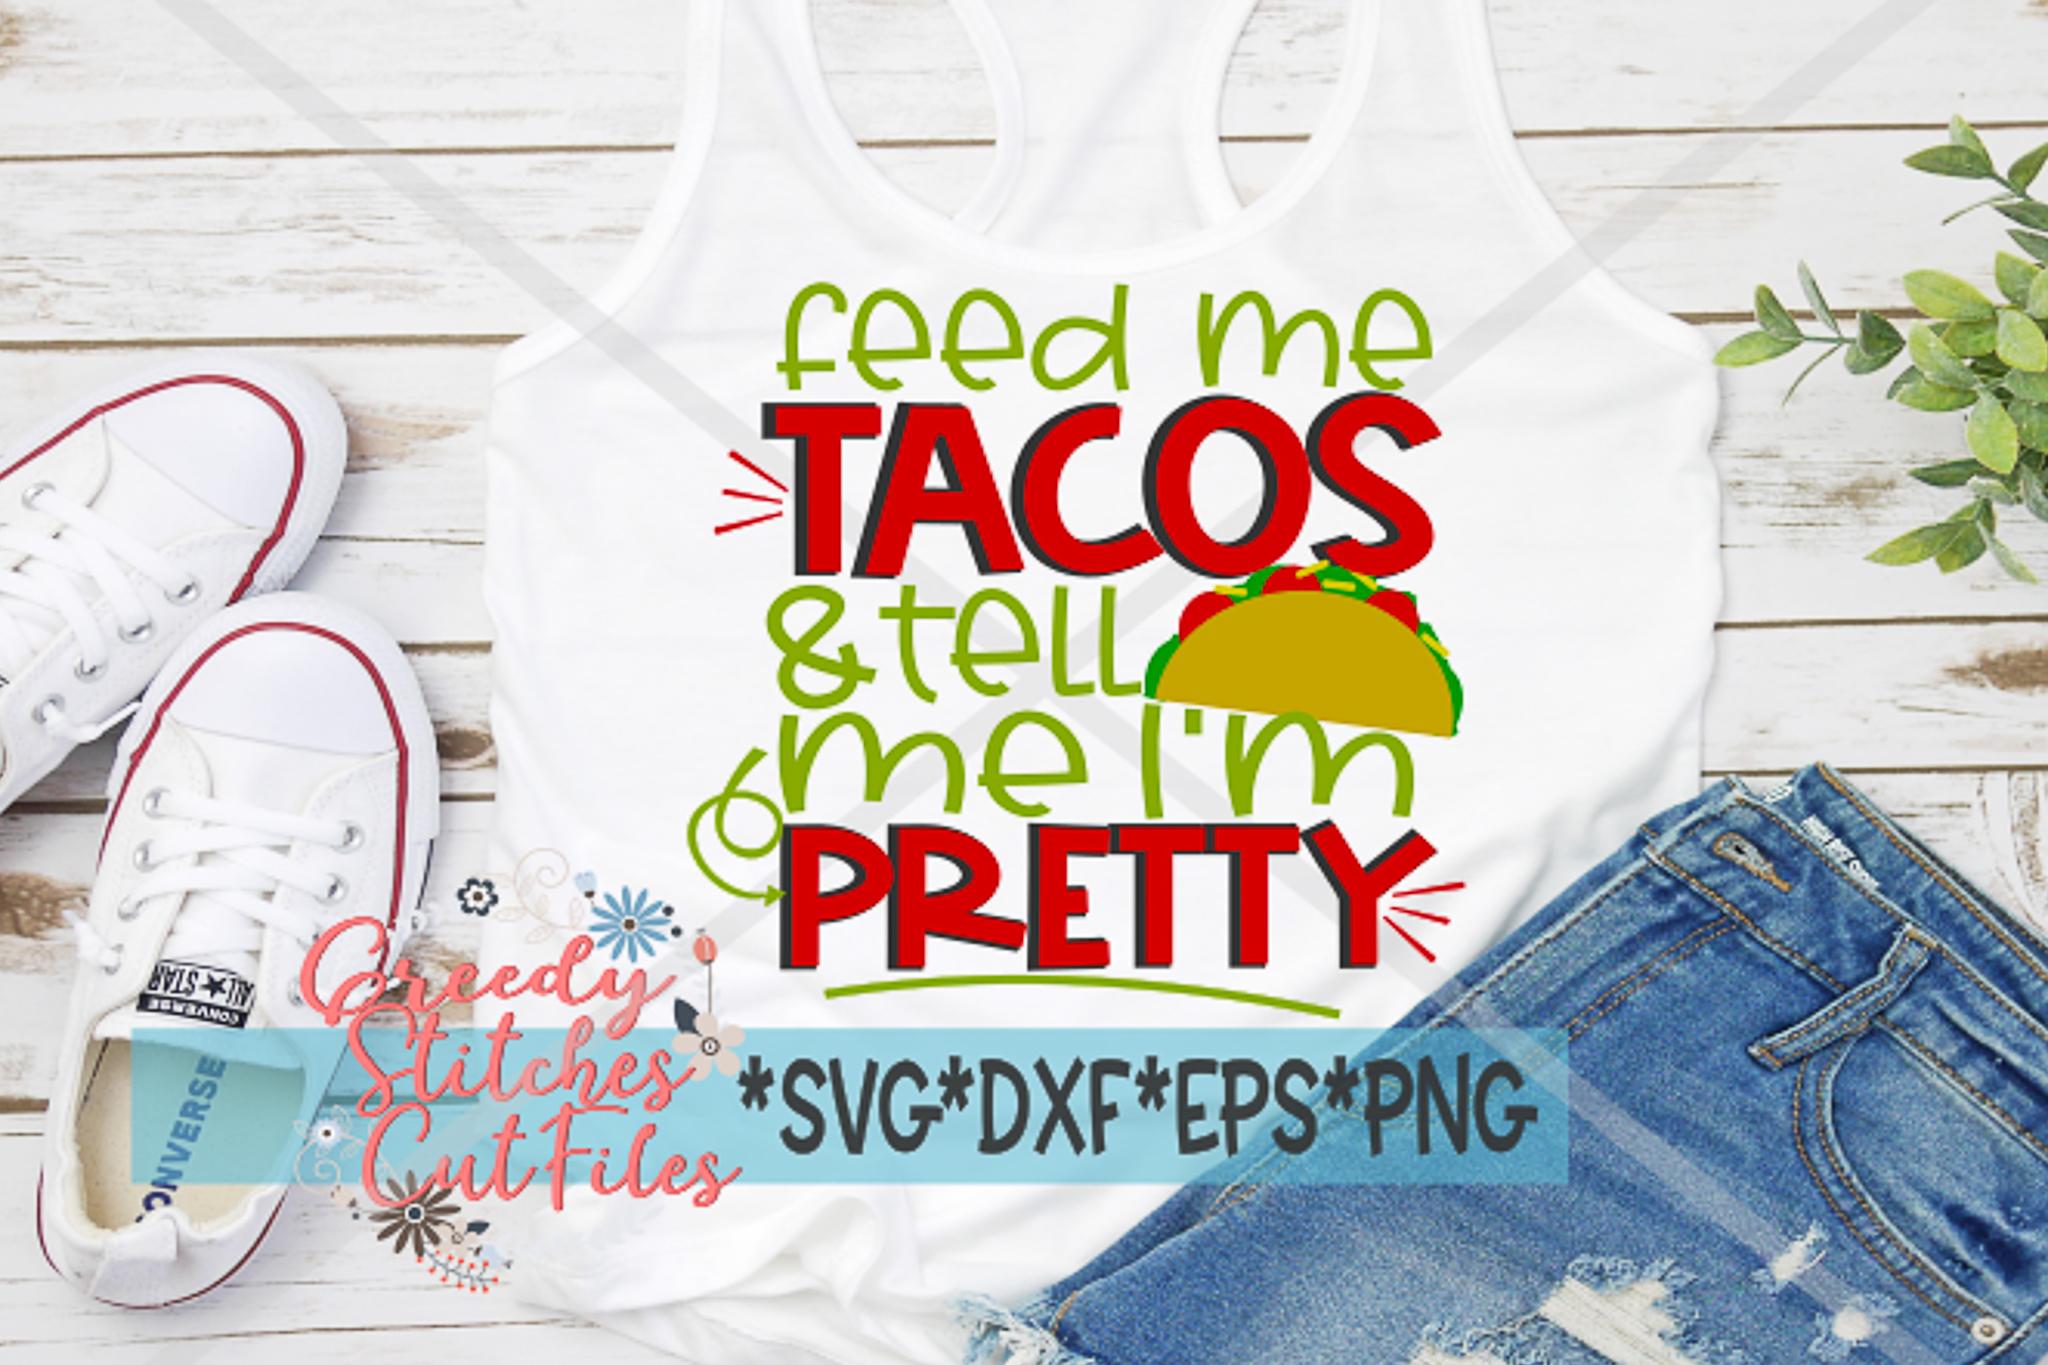 Cinco de Mayo | Feed Me Tacos & Tell Me I'm Pretty svg example image 5